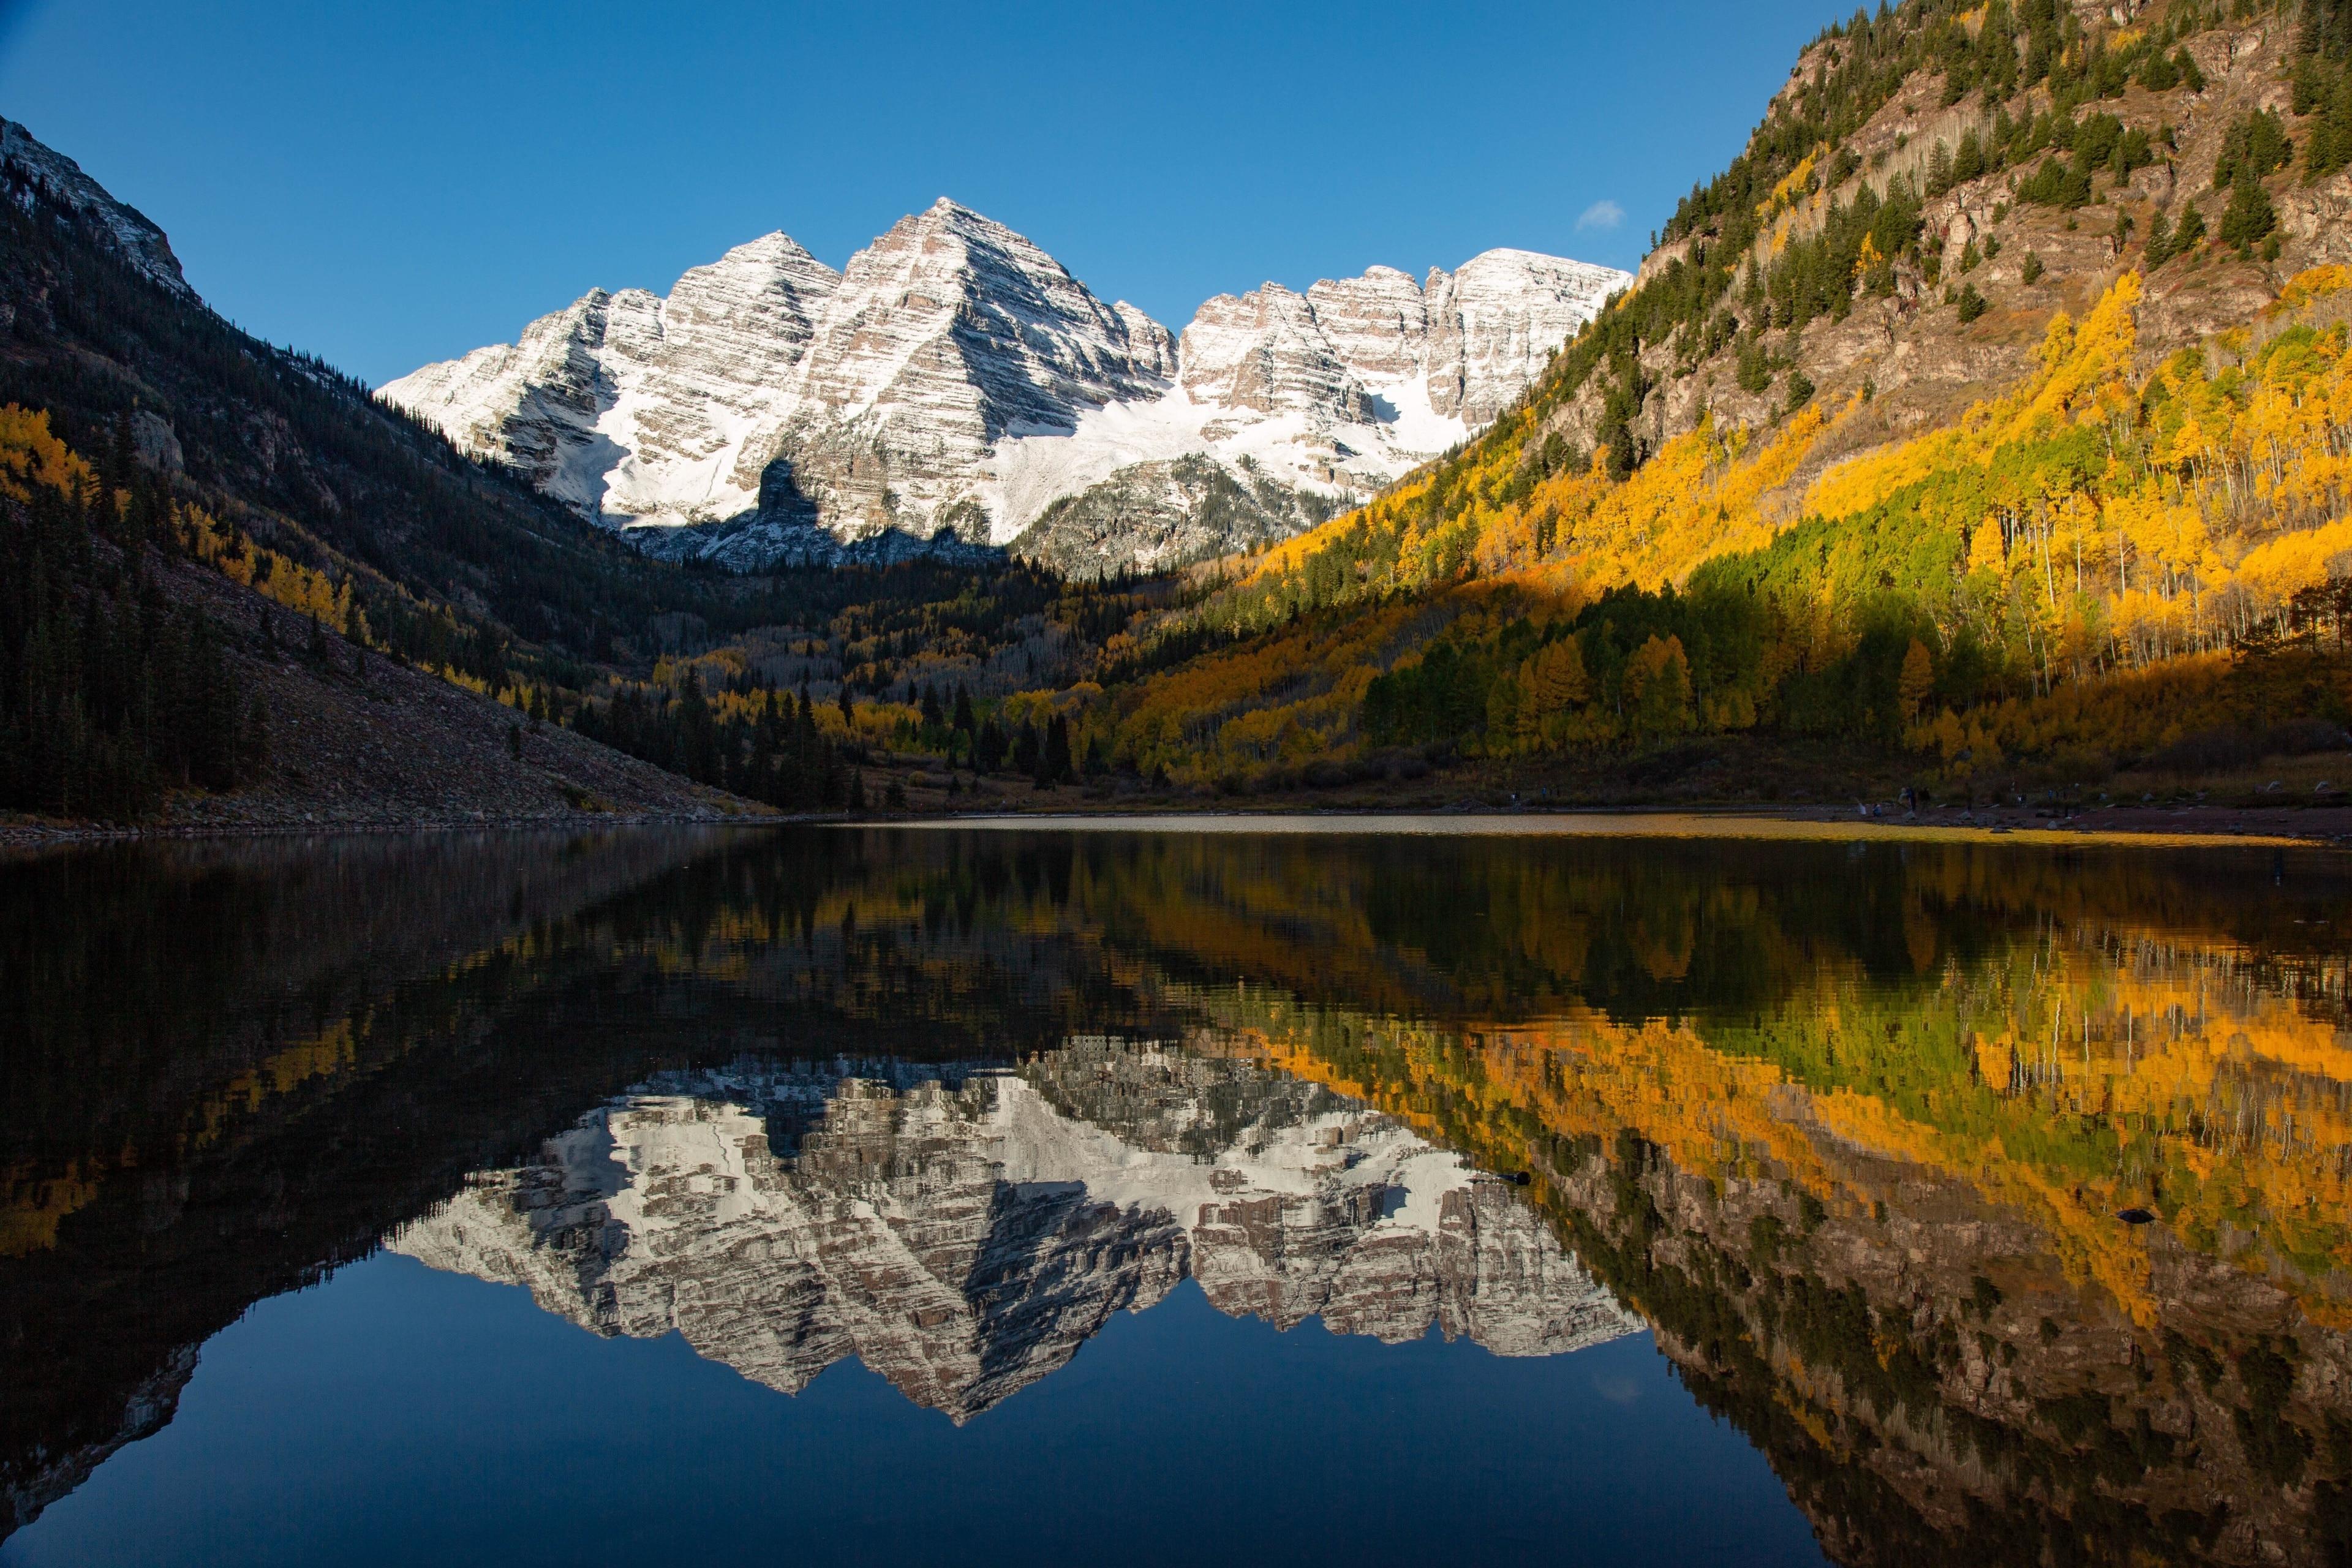 Aspen, Colorado, United States of America